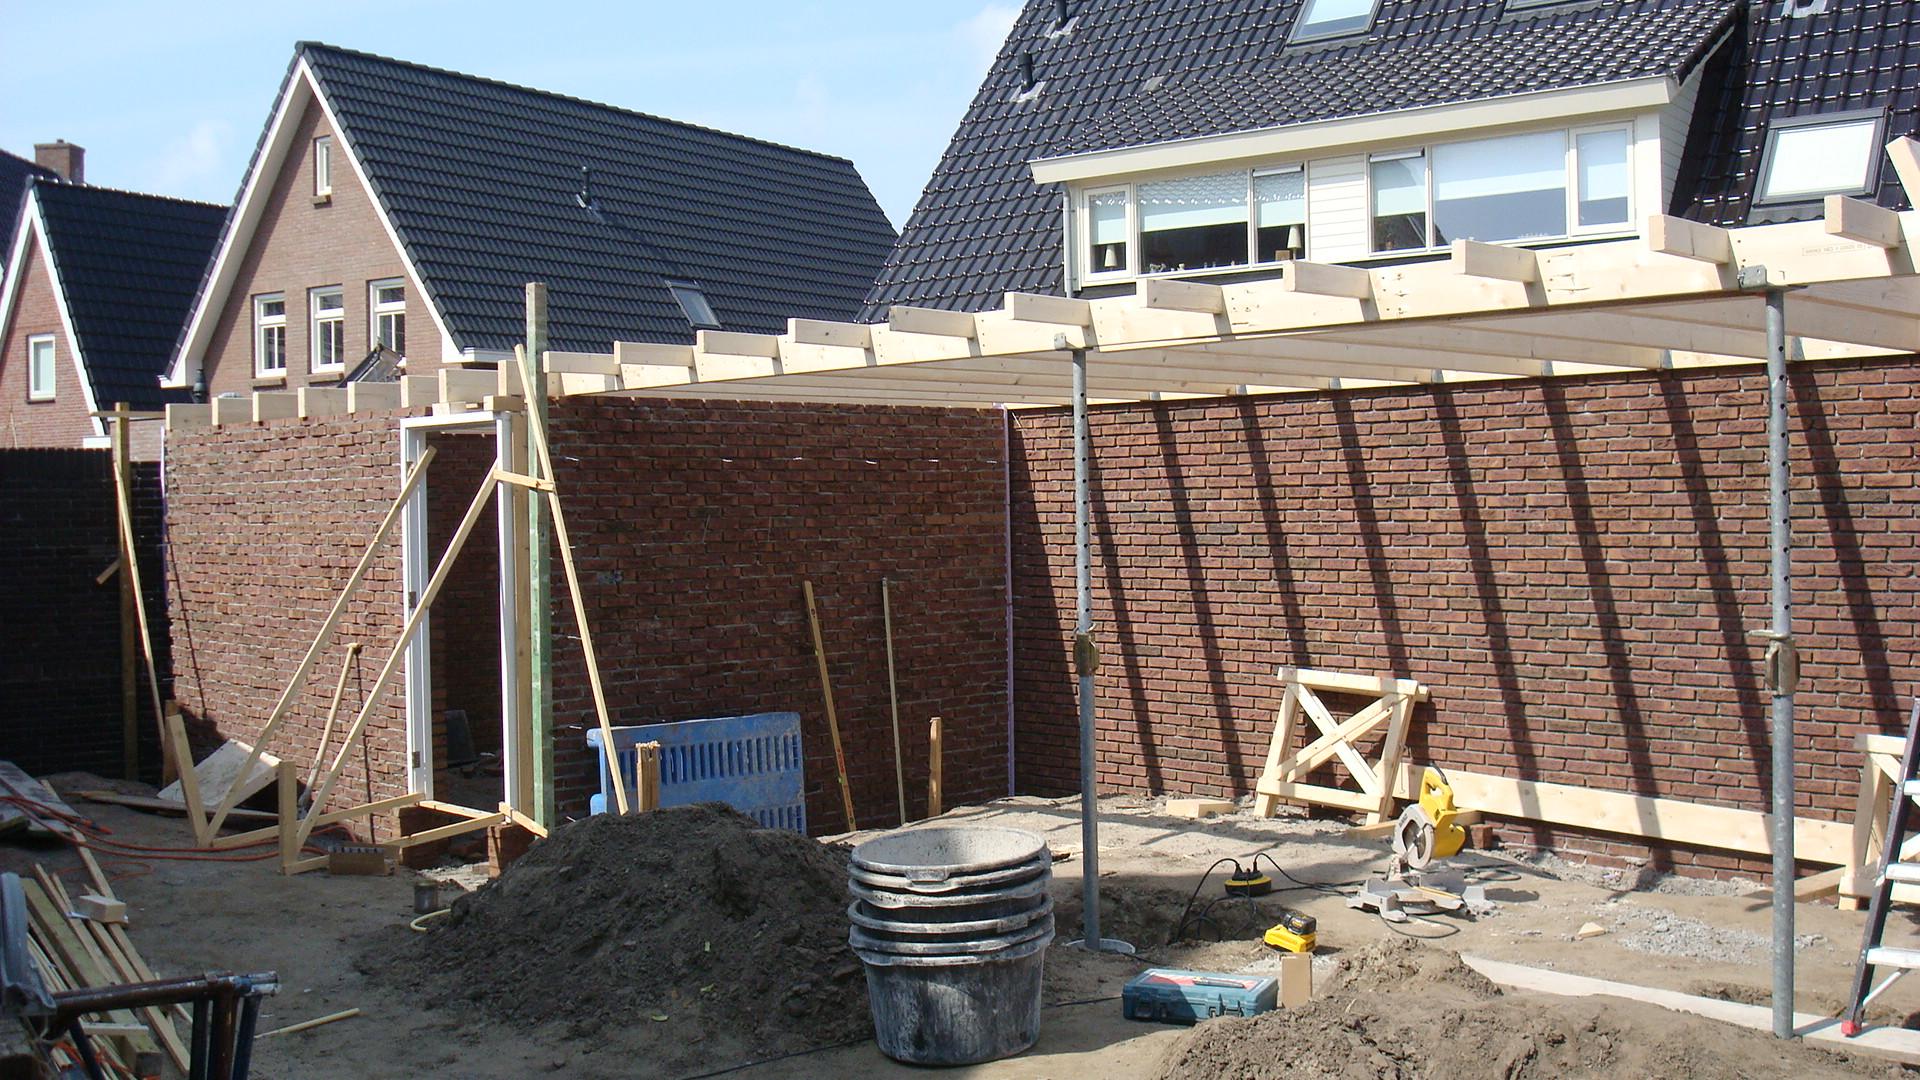 Berging met veranda te nijkerk bouwbedrijf kas for Berging met veranda